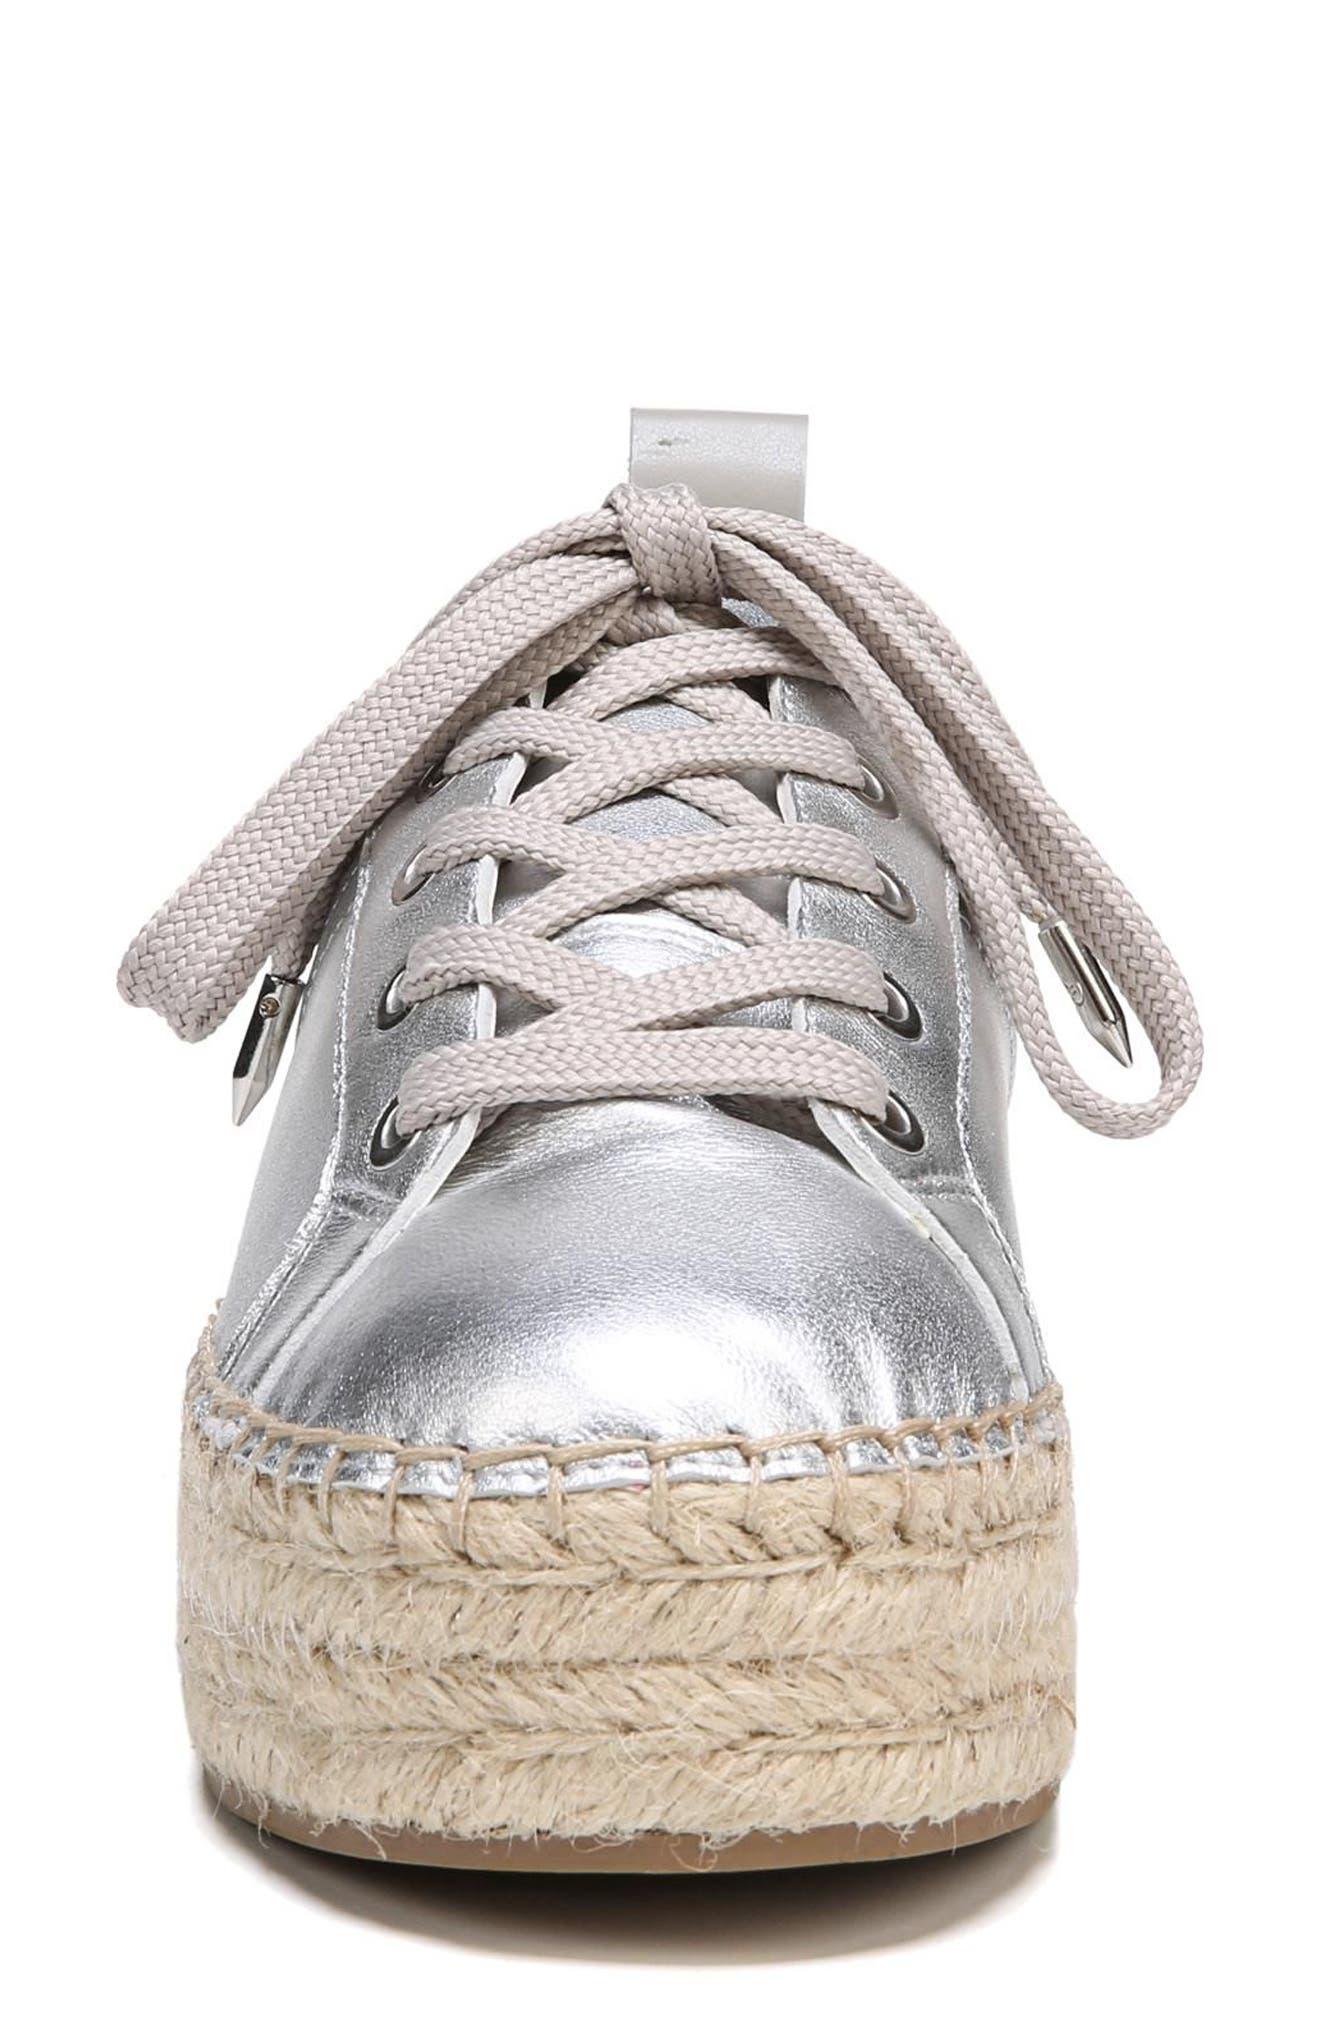 Carleigh Espadrille Sneaker,                             Alternate thumbnail 4, color,                             040